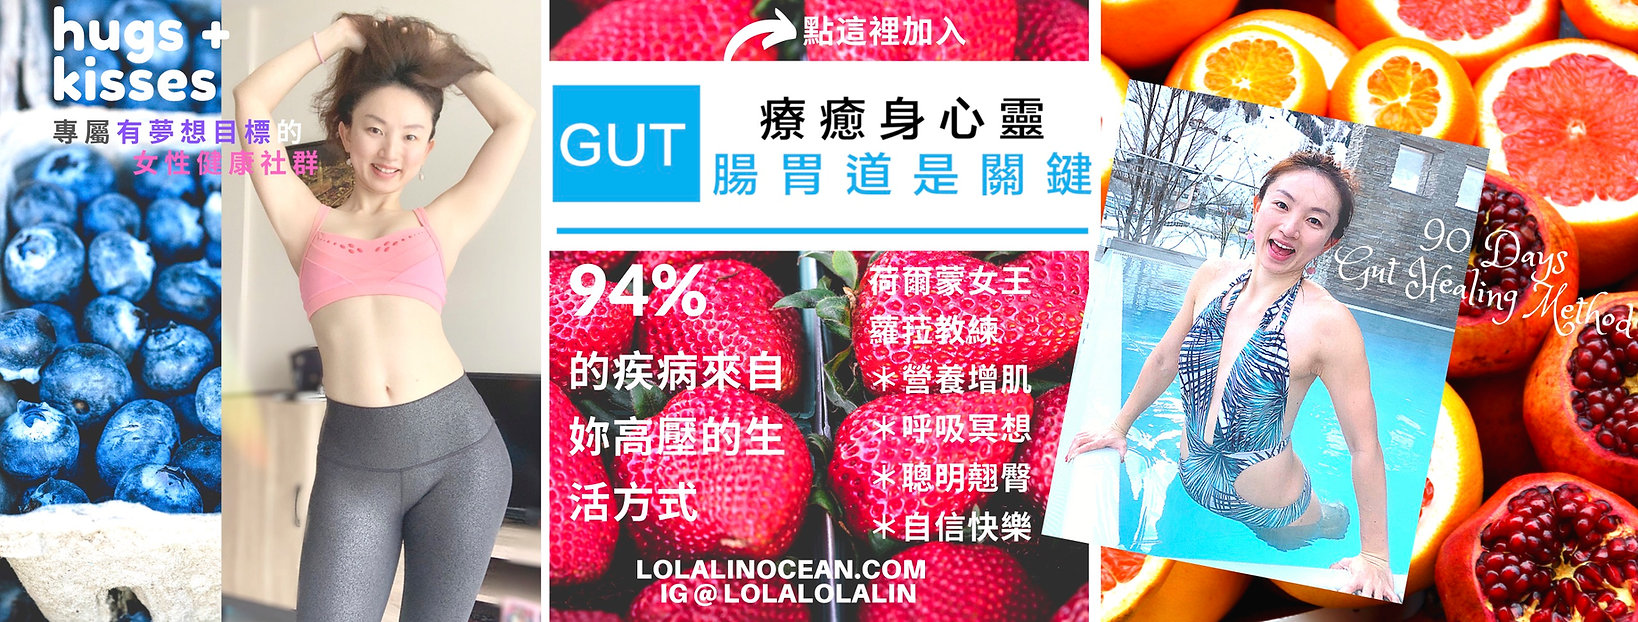 Terra Garden Grocer (1).jpg